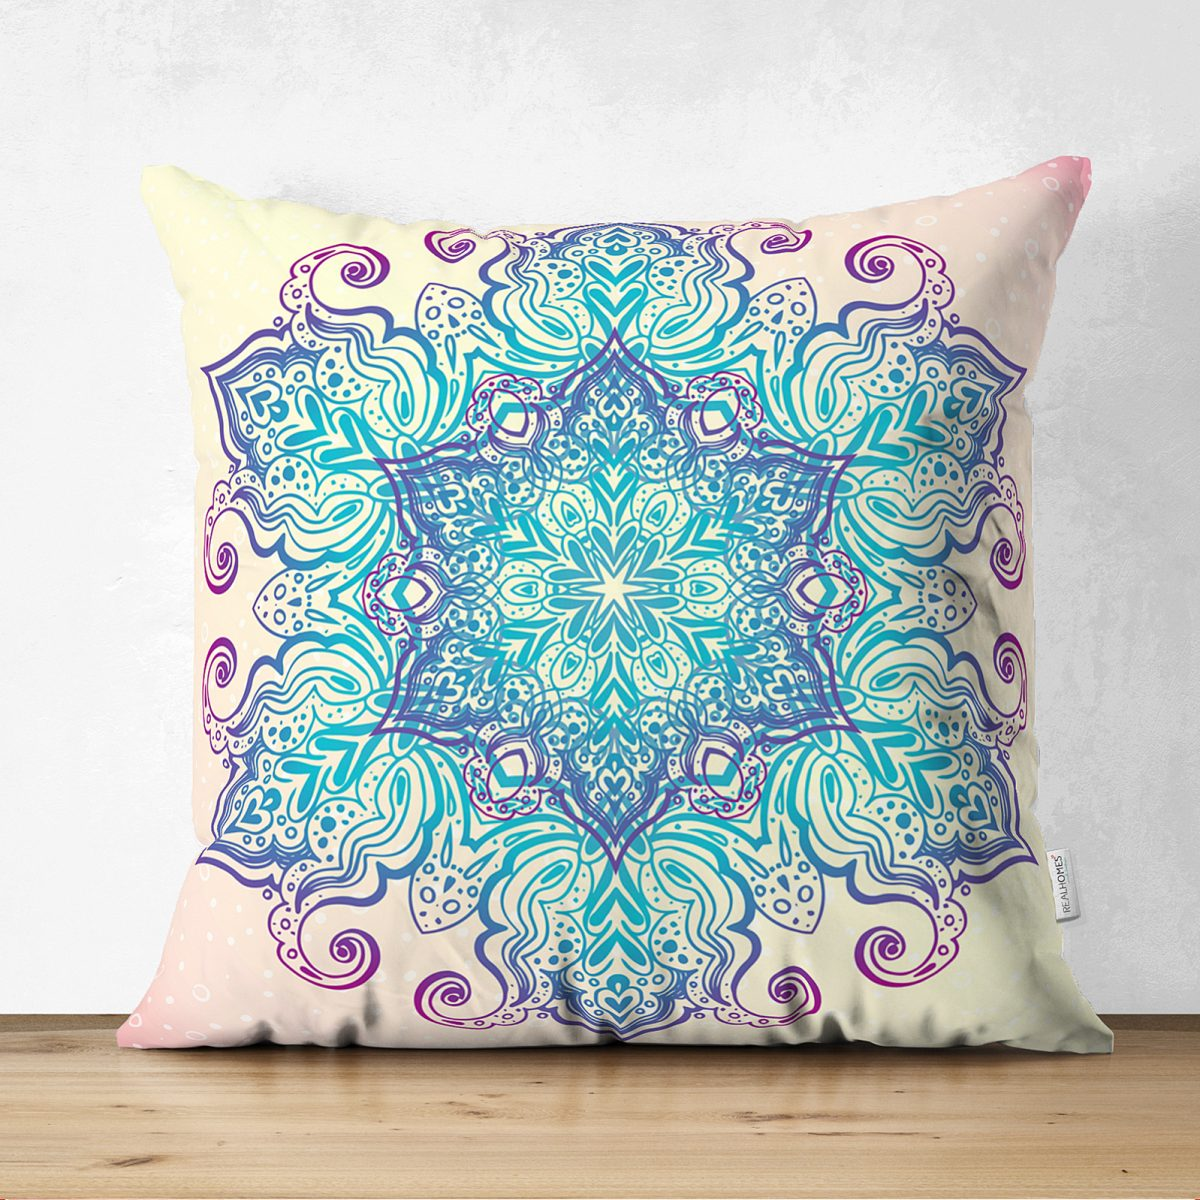 Pembe Zeminde Mavi Mandala Çizimli Modern Çift Taraflı Süet Yastık Kılıfı Realhomes